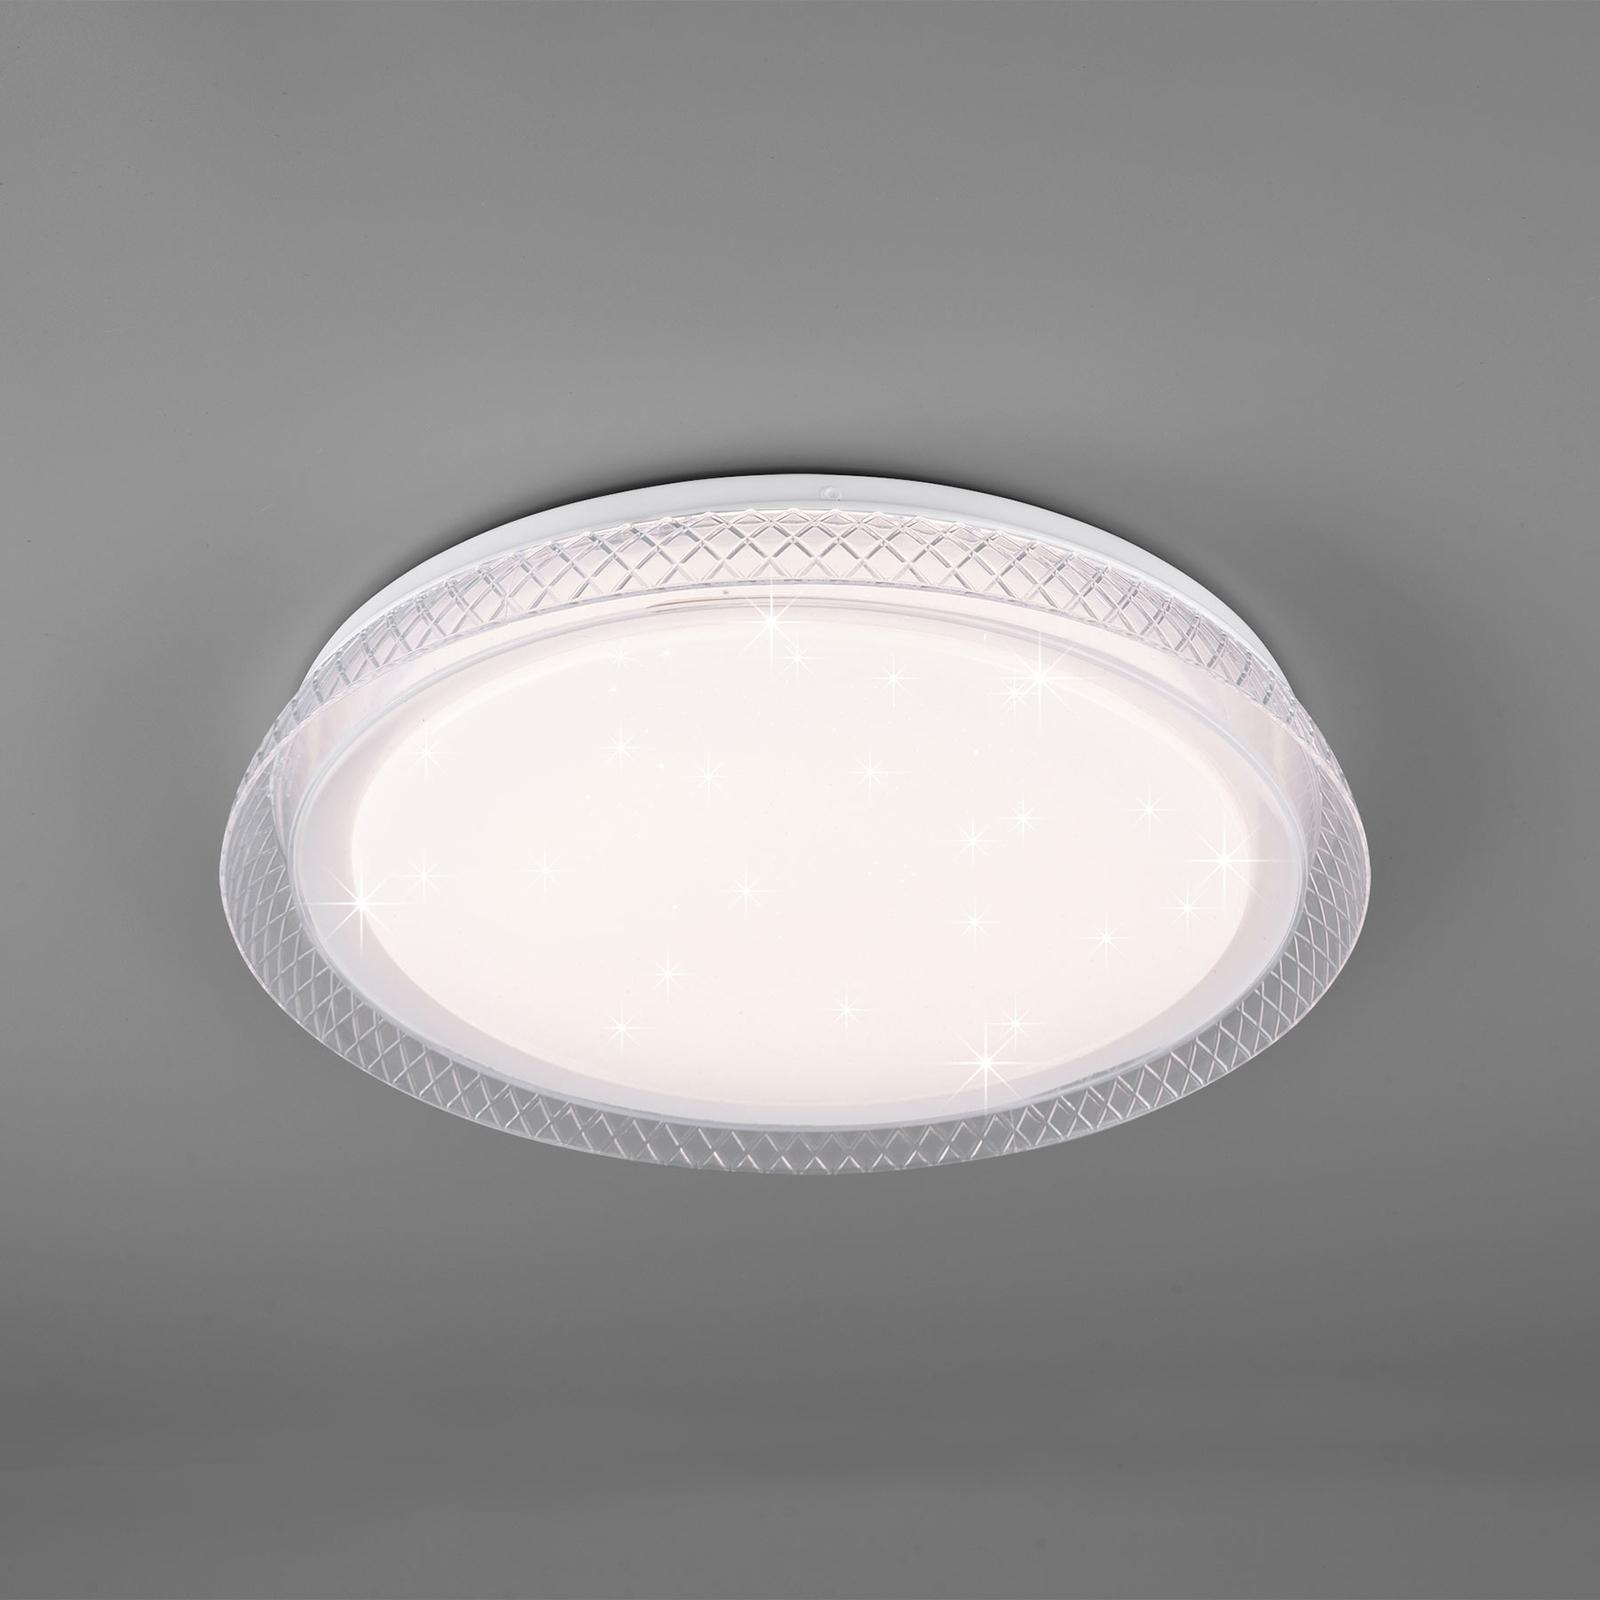 LED-kattovalaisin Heracles tunable white Ø 38cm